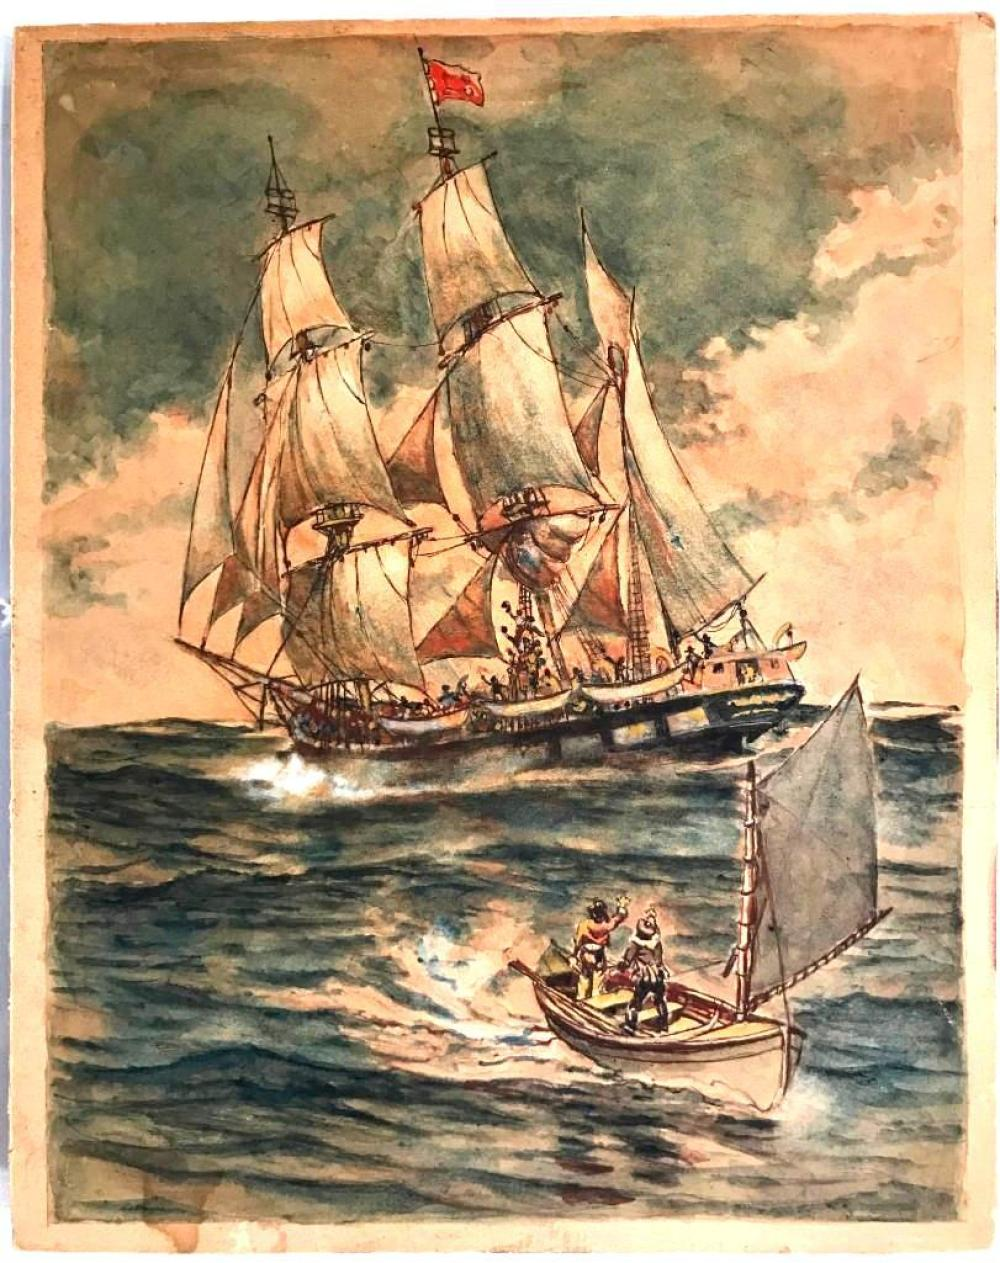 Watercolor Harbor Scene - Howard Pyle Attributed